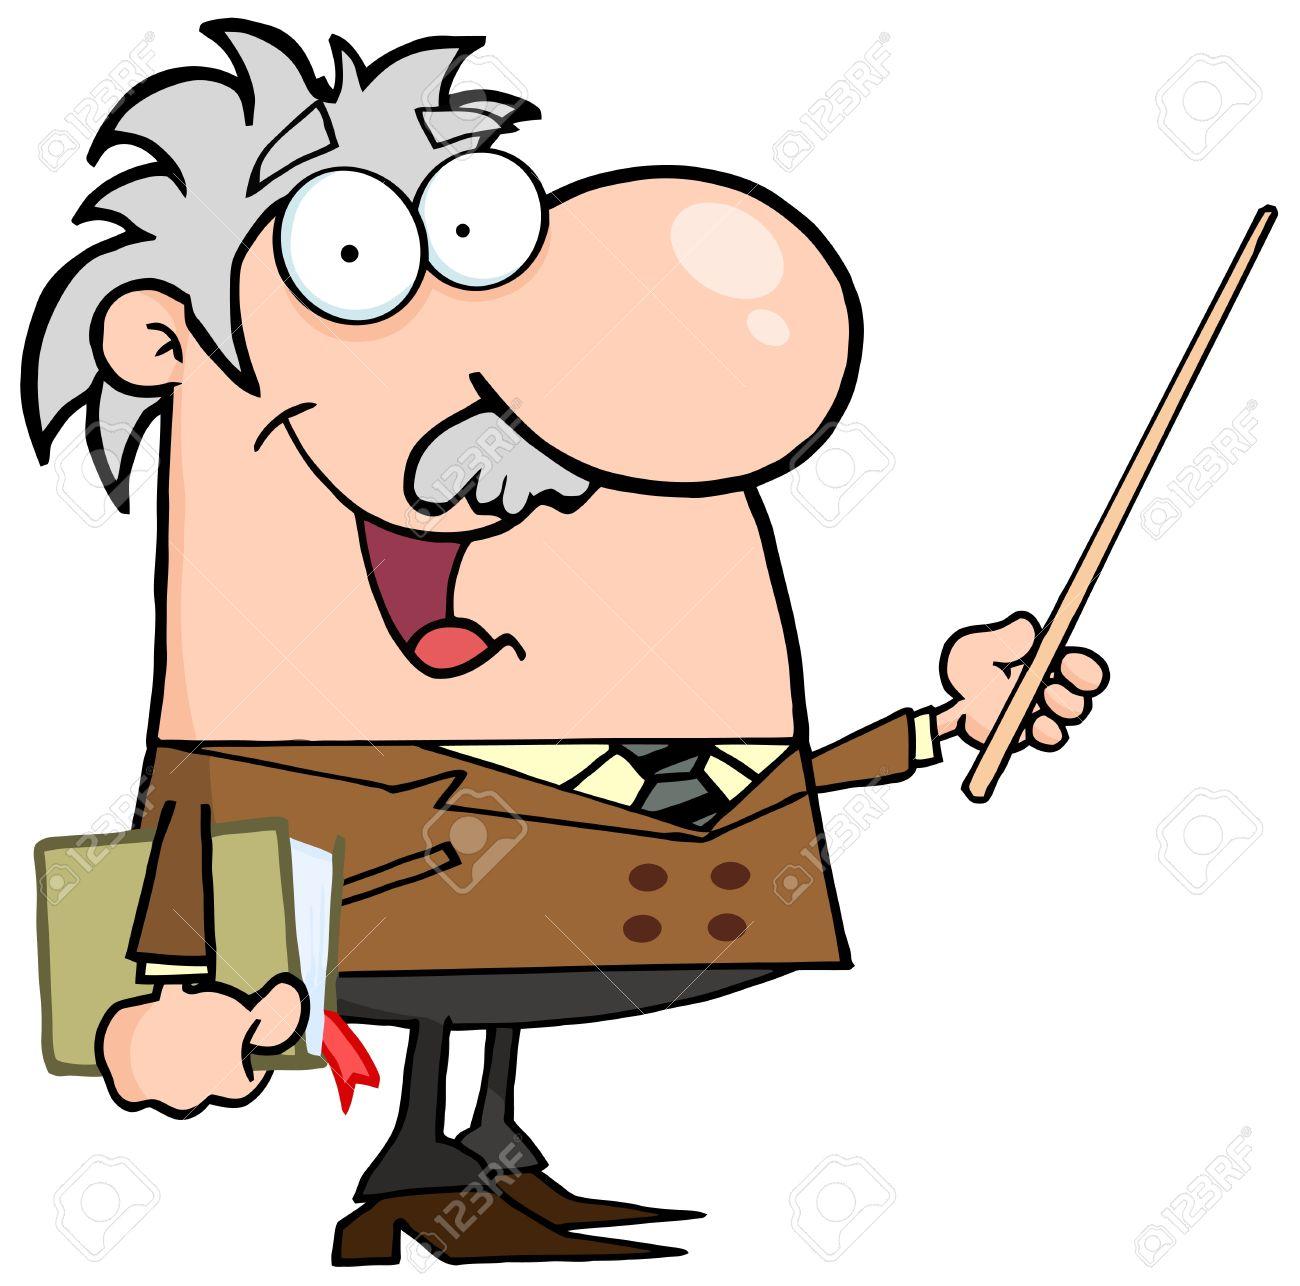 Happy Caucasian Professor Using A Pointer Stick Stock Vector - 13299044